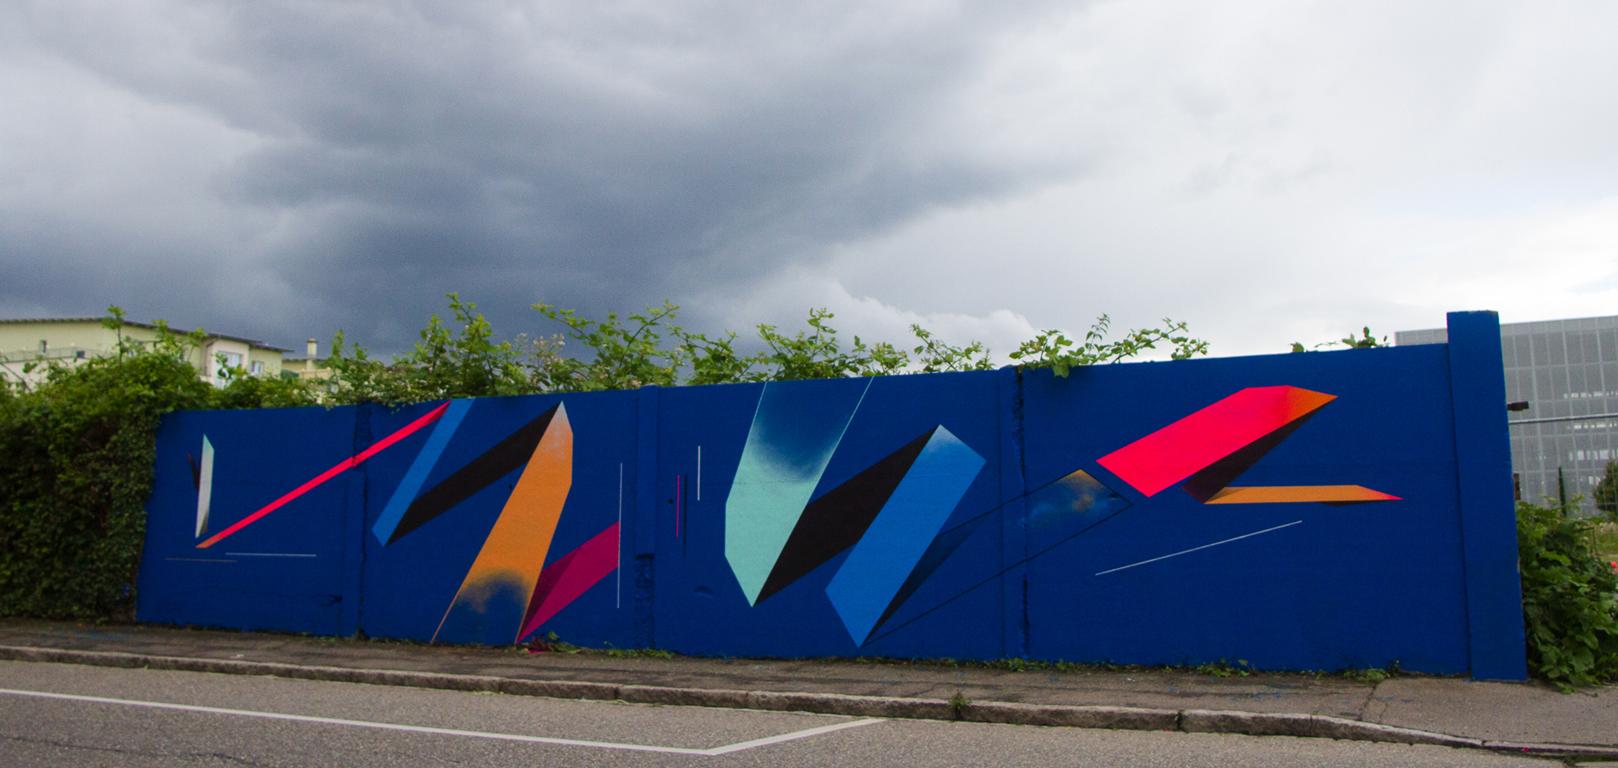 Cola Gallery - 2016 Weil am Rhein